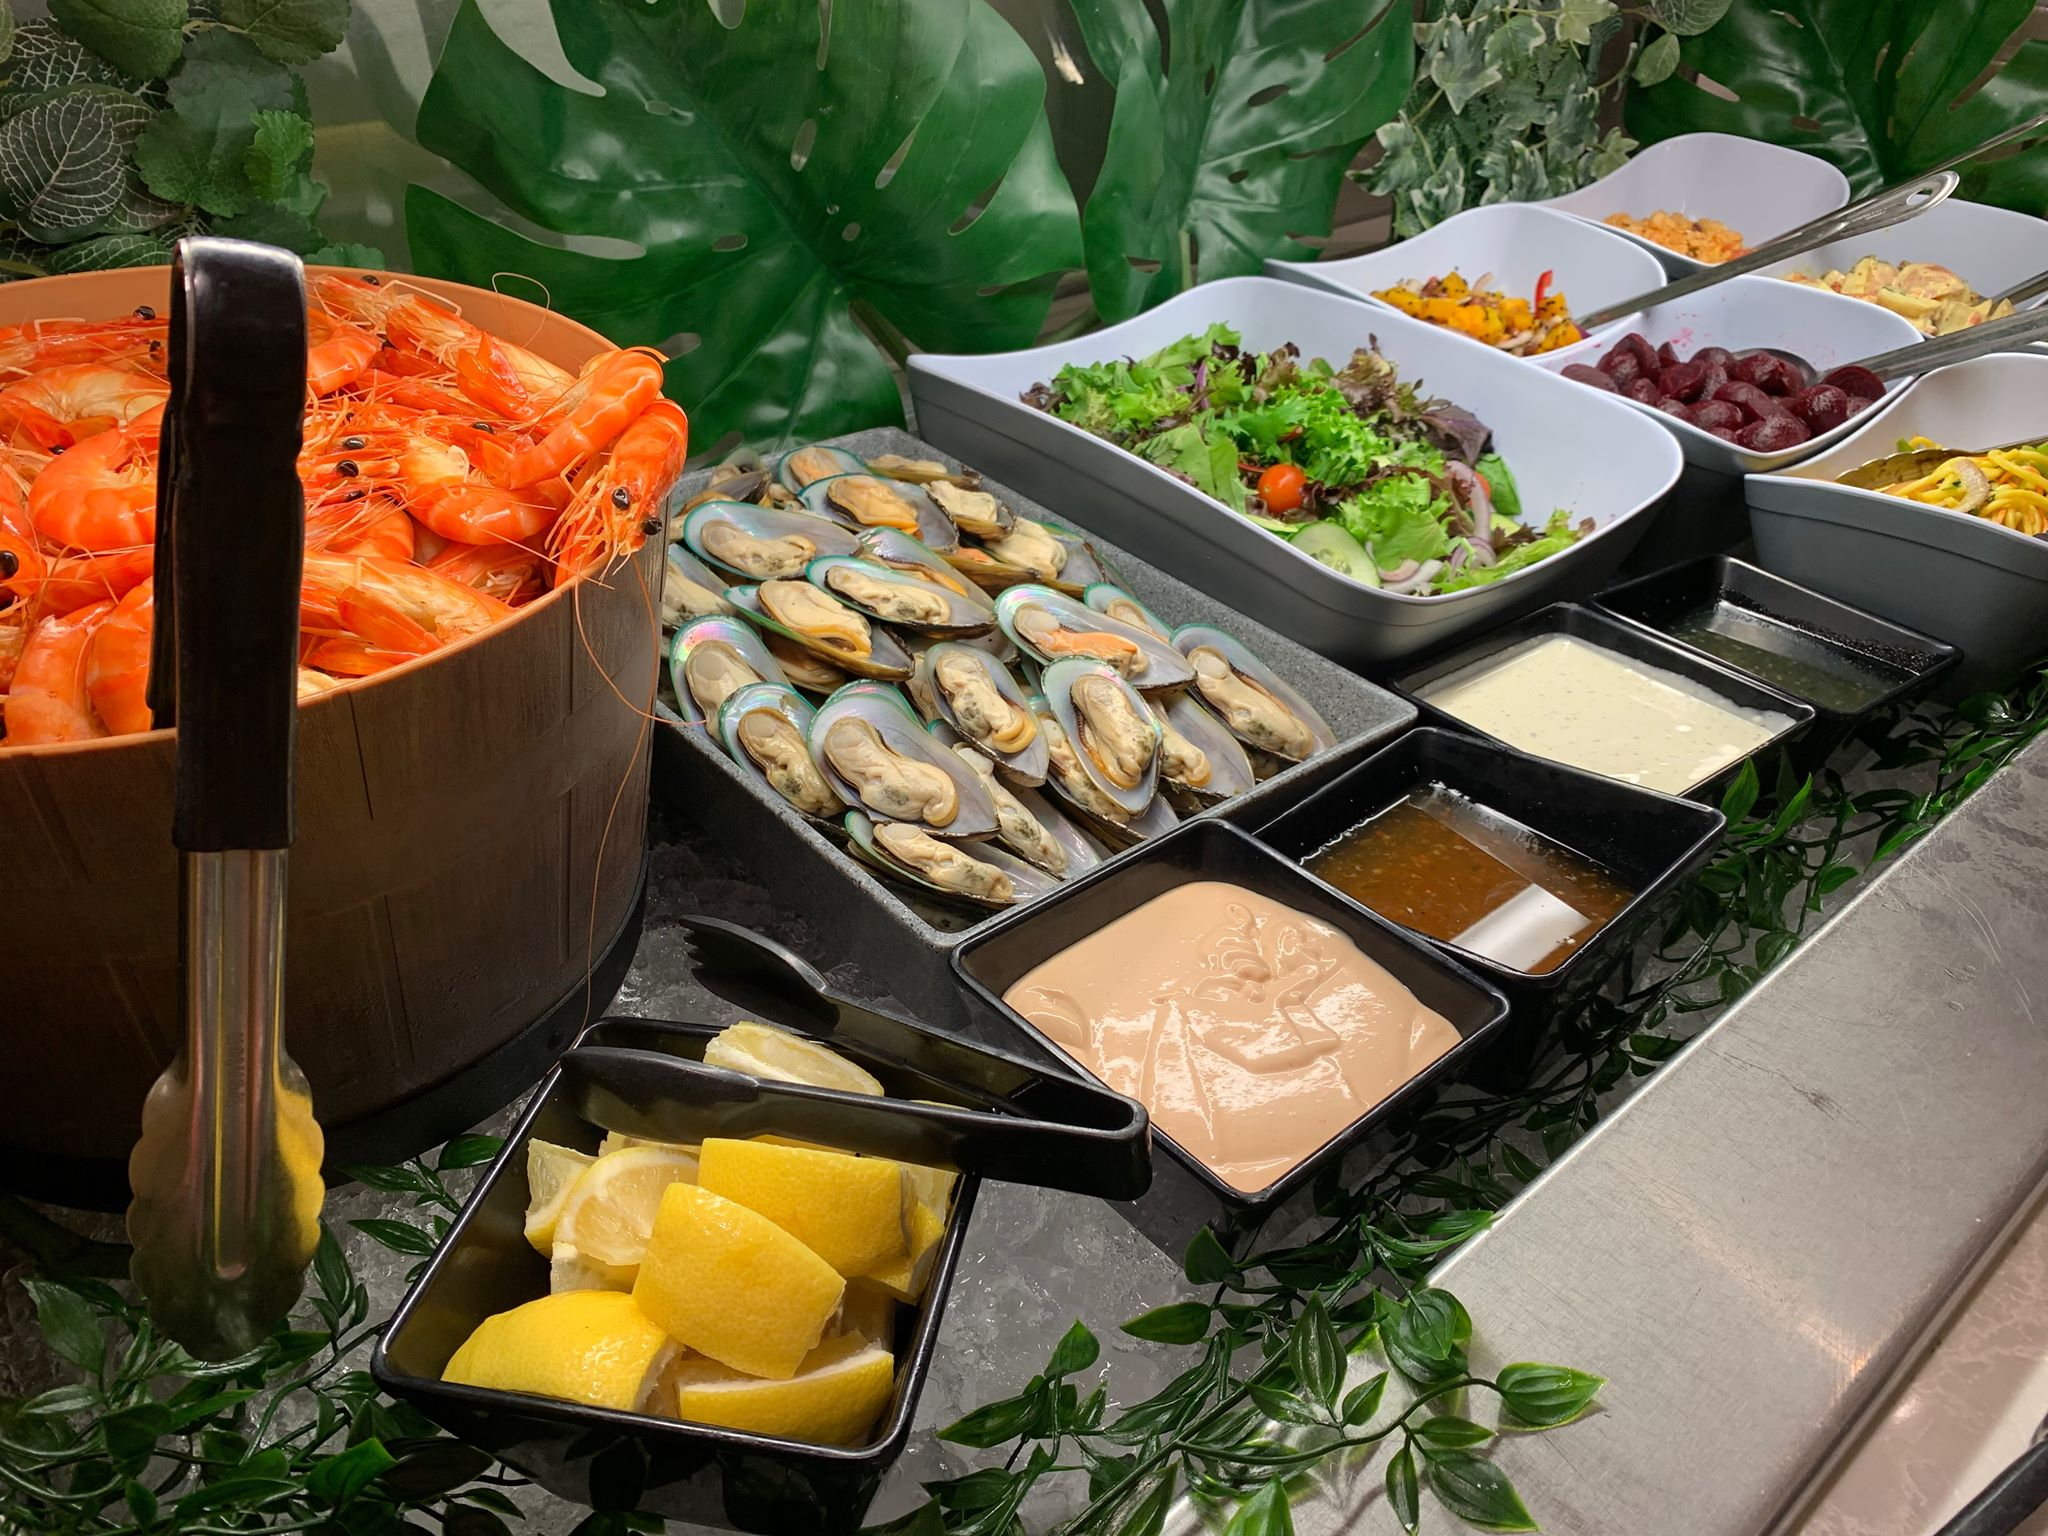 Salad bar with prawns.jpg